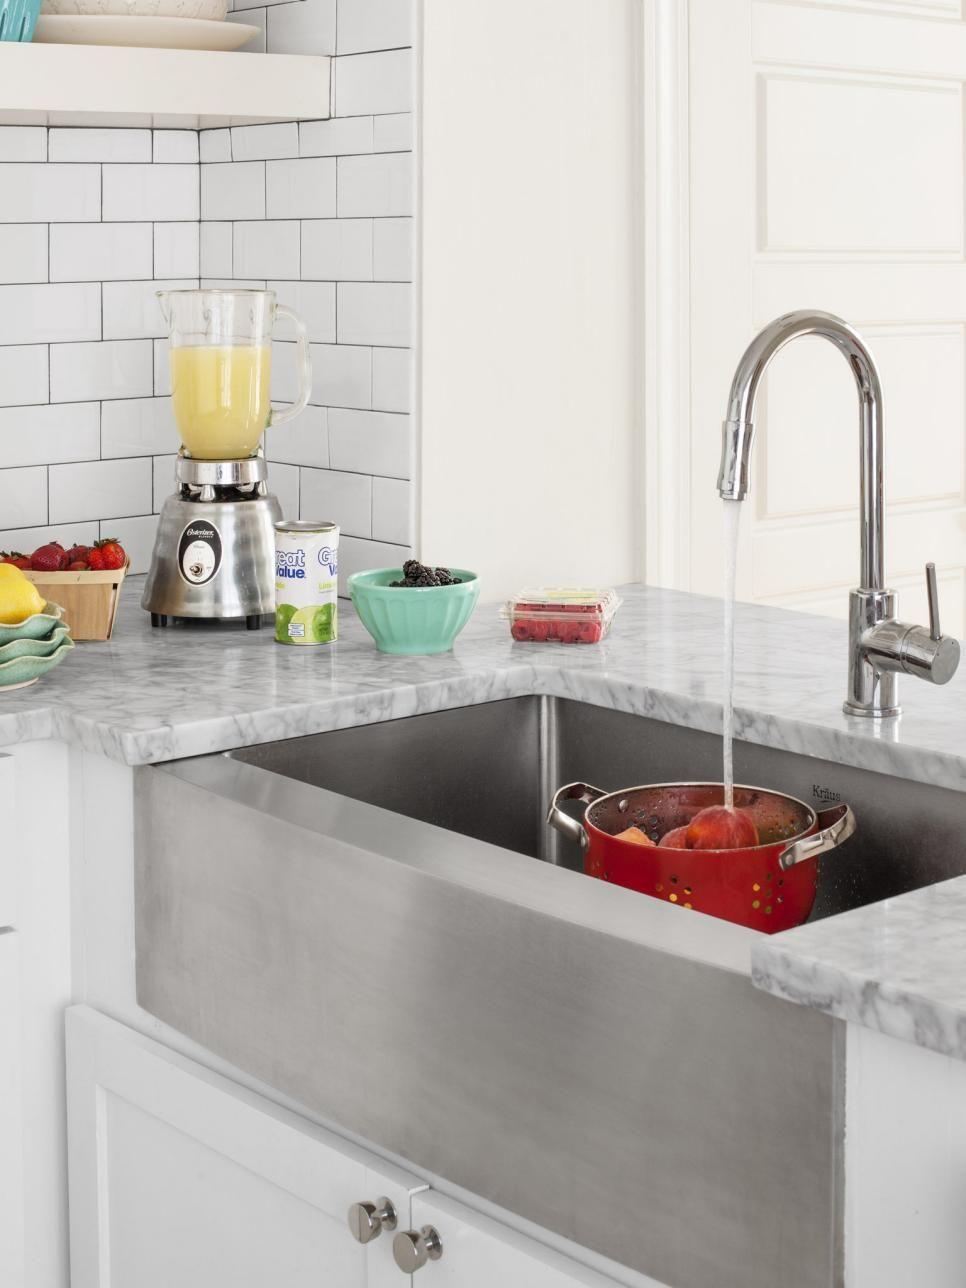 Dxv Hillside 30 Inch Stainless Steel Kitchen Sink Stainless Steel